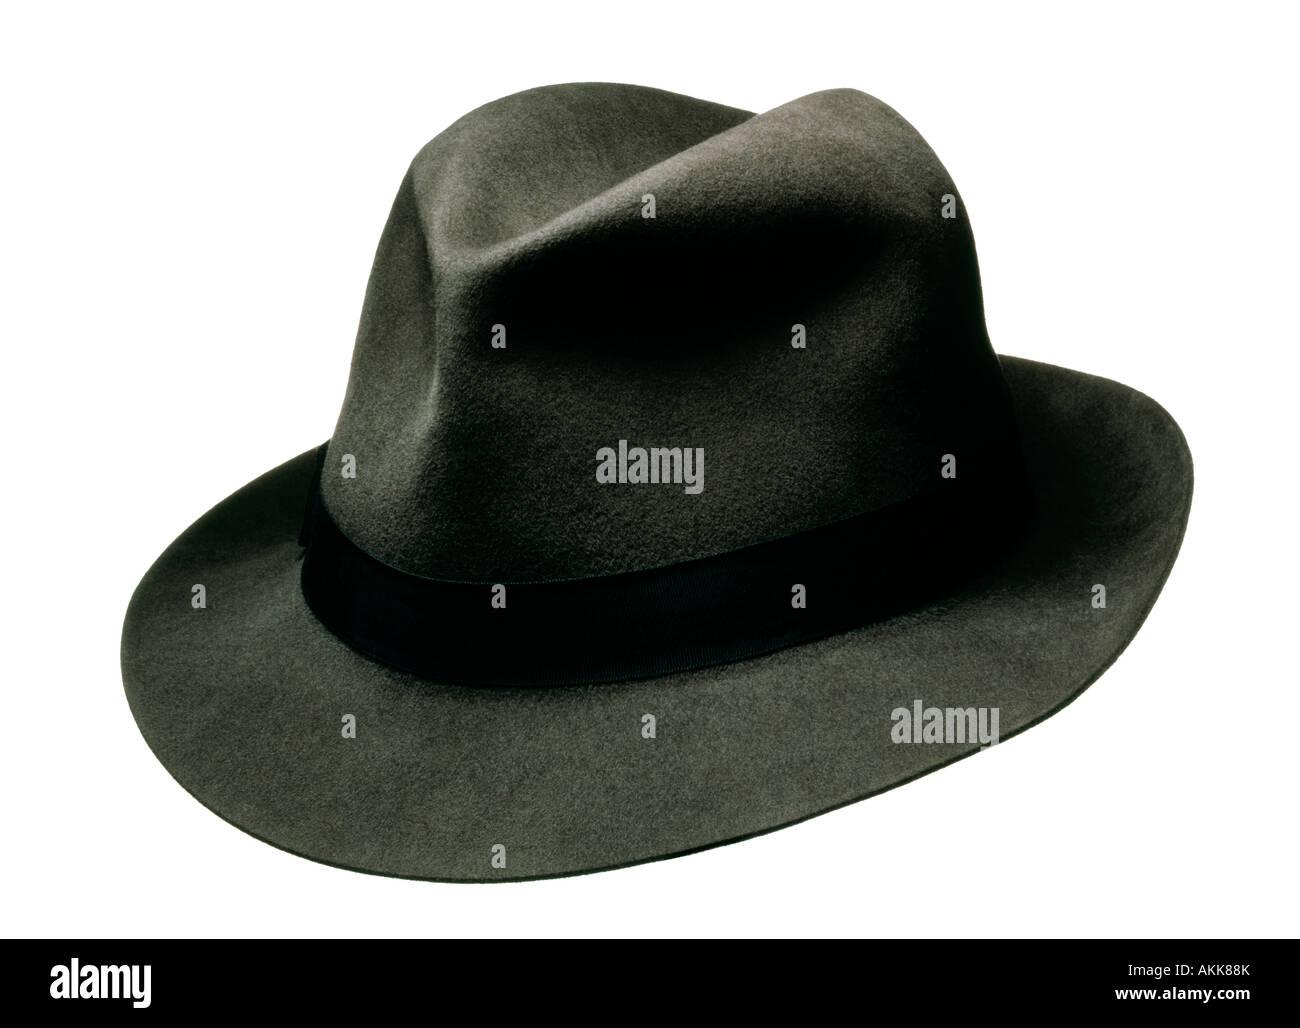 FELT TRILBY HAT SIMILAR AS WORN BY FRANK SINATRA - Stock Image